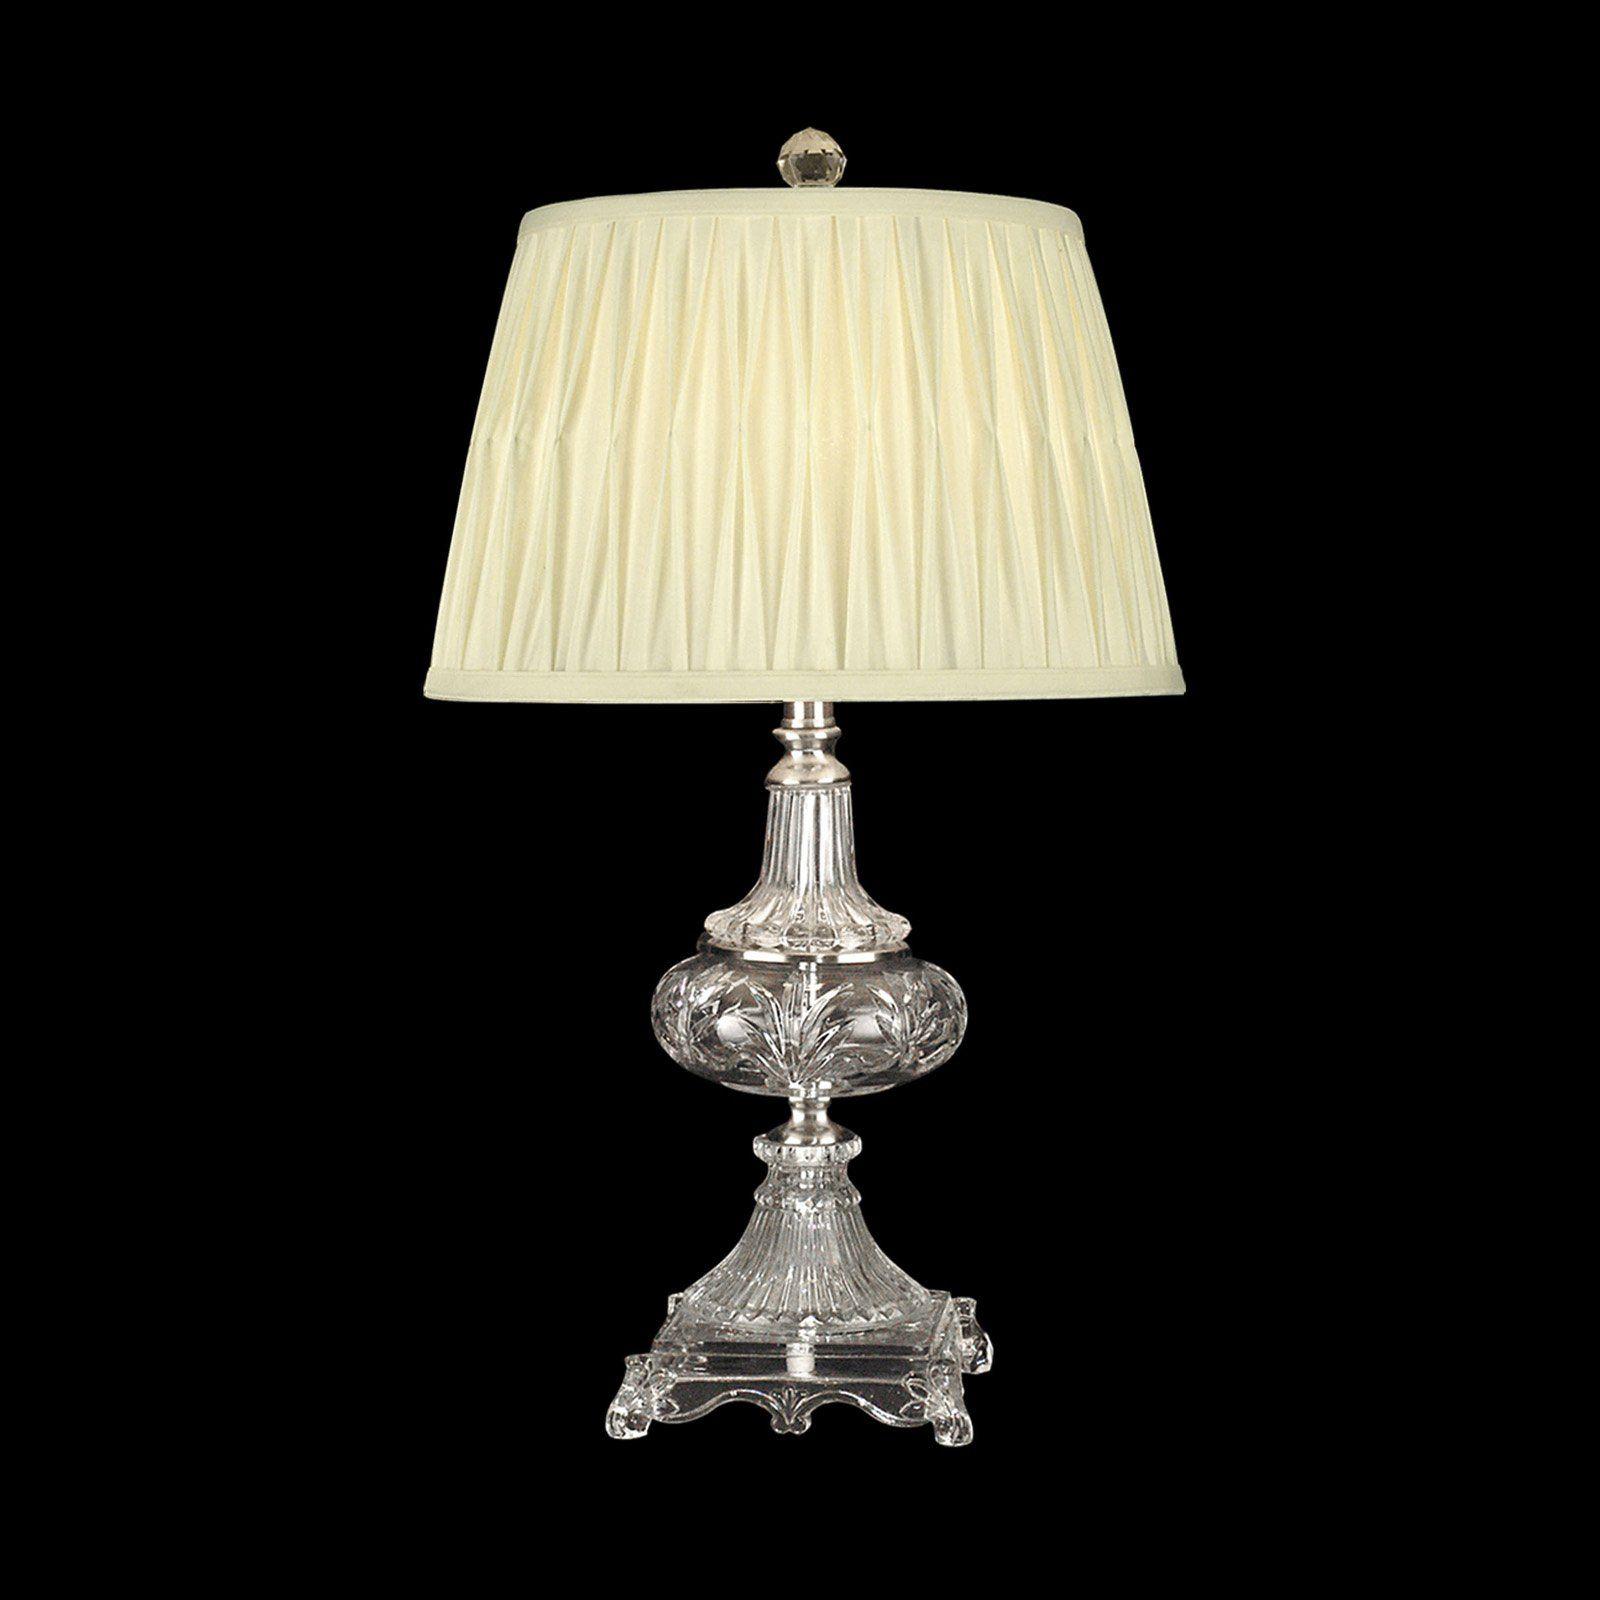 Dale tiffany murphy table lamp